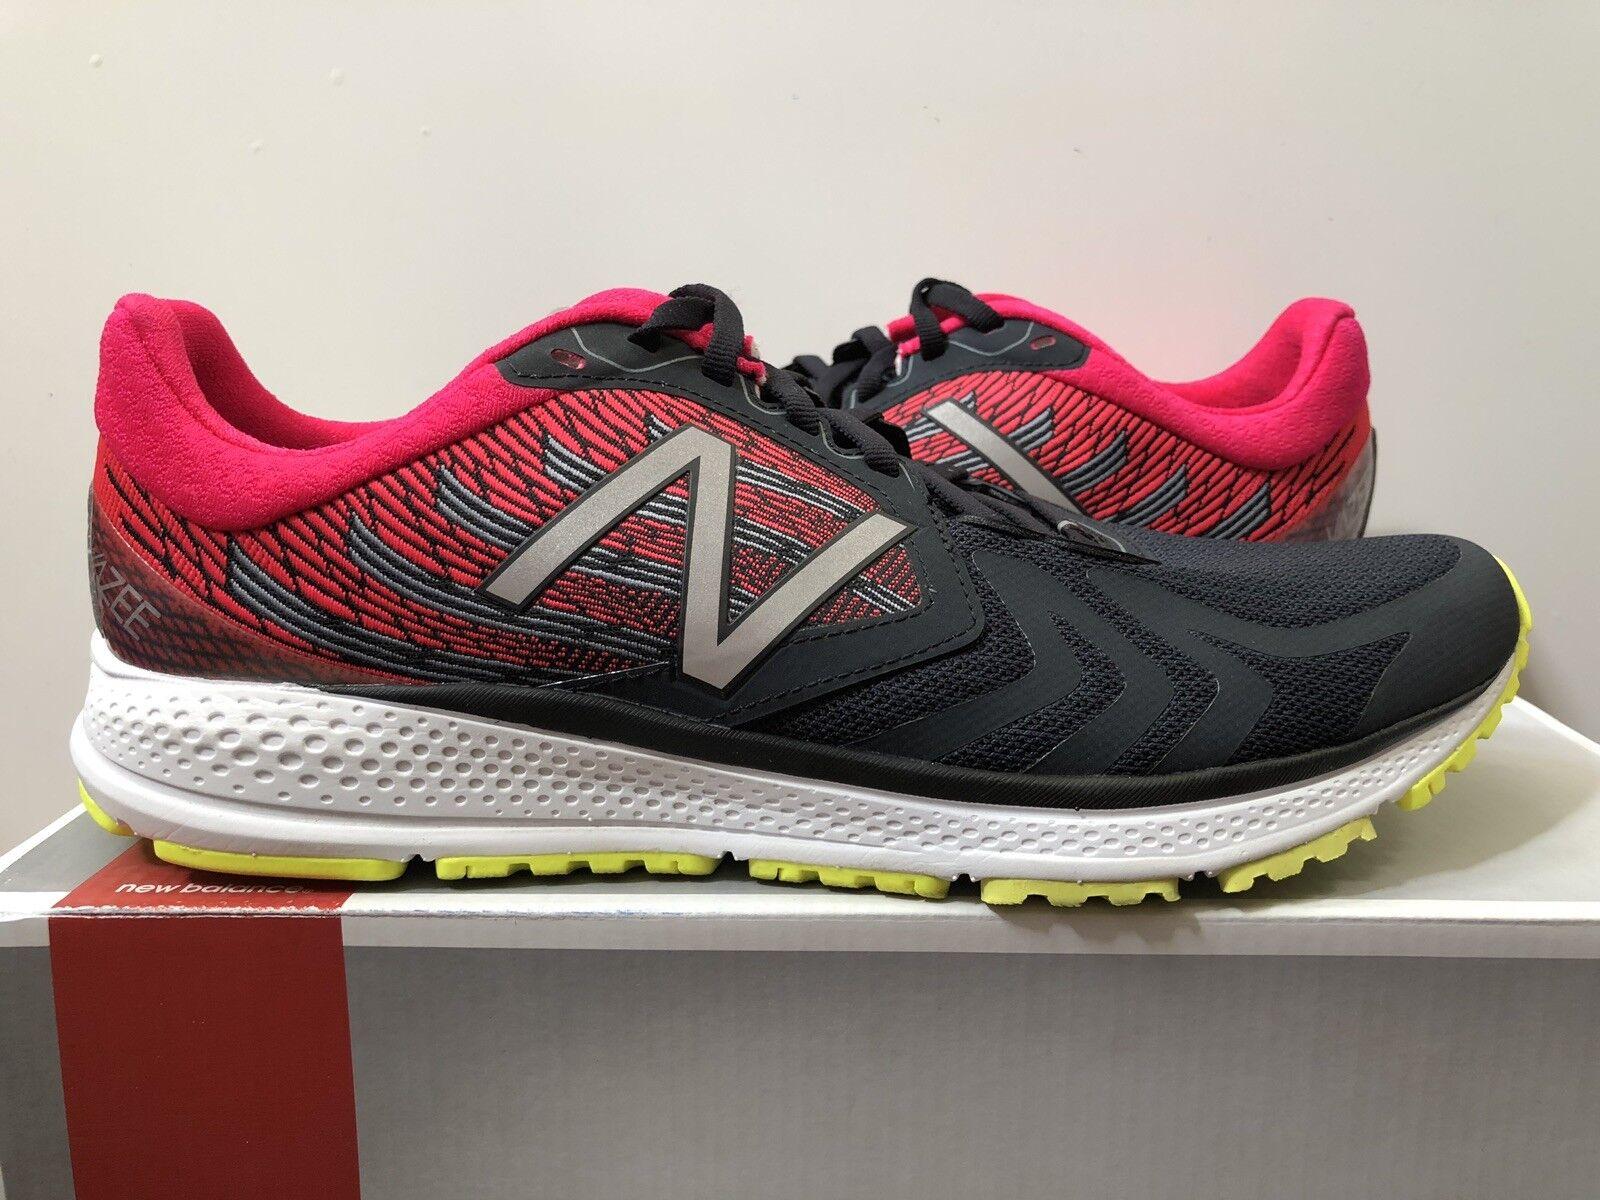 Men's New Balance Speed Vazee MPACEBR2 Black Pink Size 9.5 Running shoes